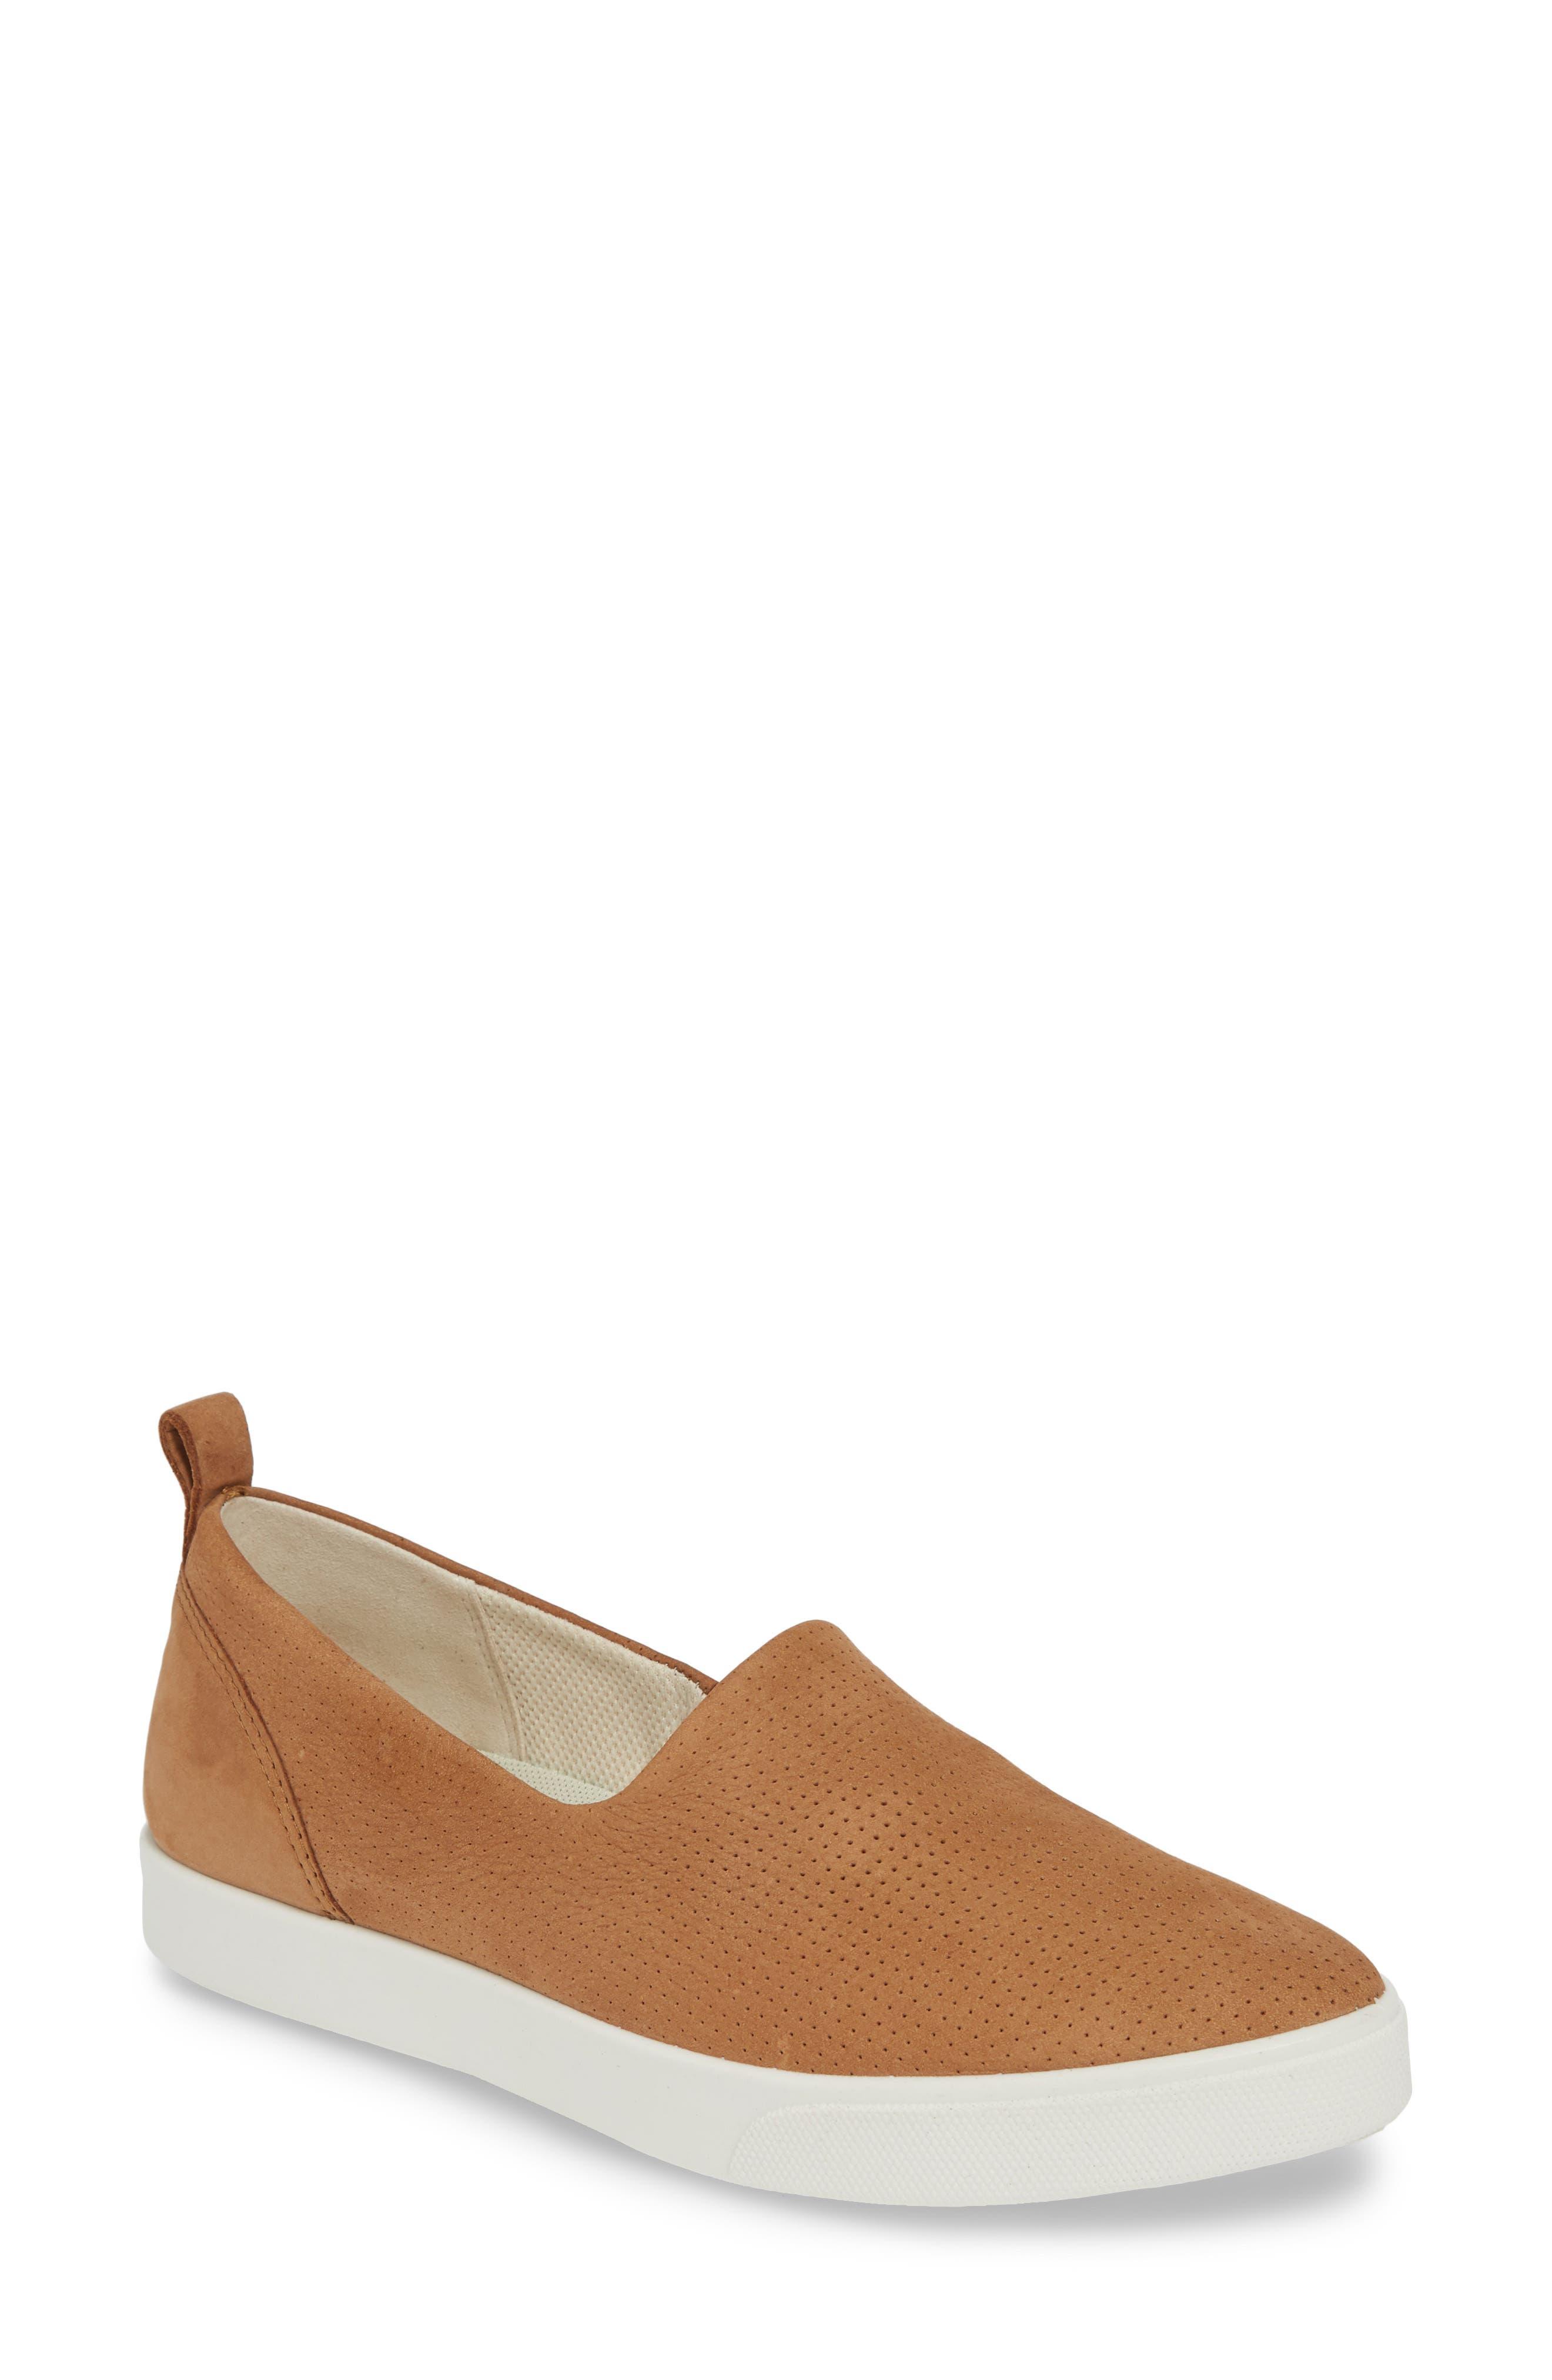 Ecco Gillian Slip-On Sneaker, Brown